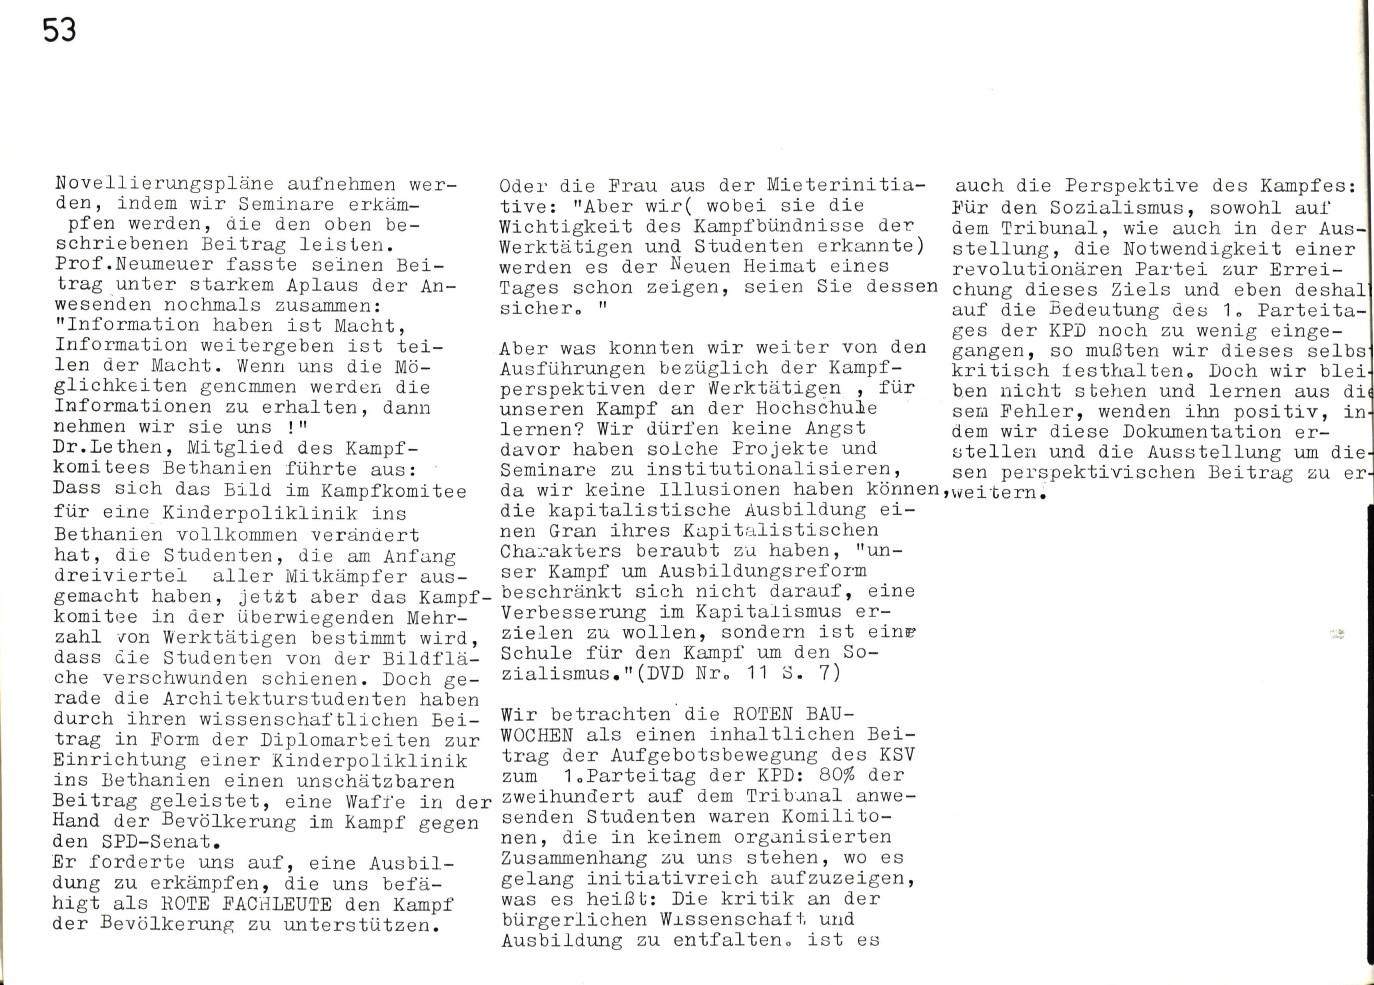 Berlin_KSV_1974_Rote_Bauwochen_69